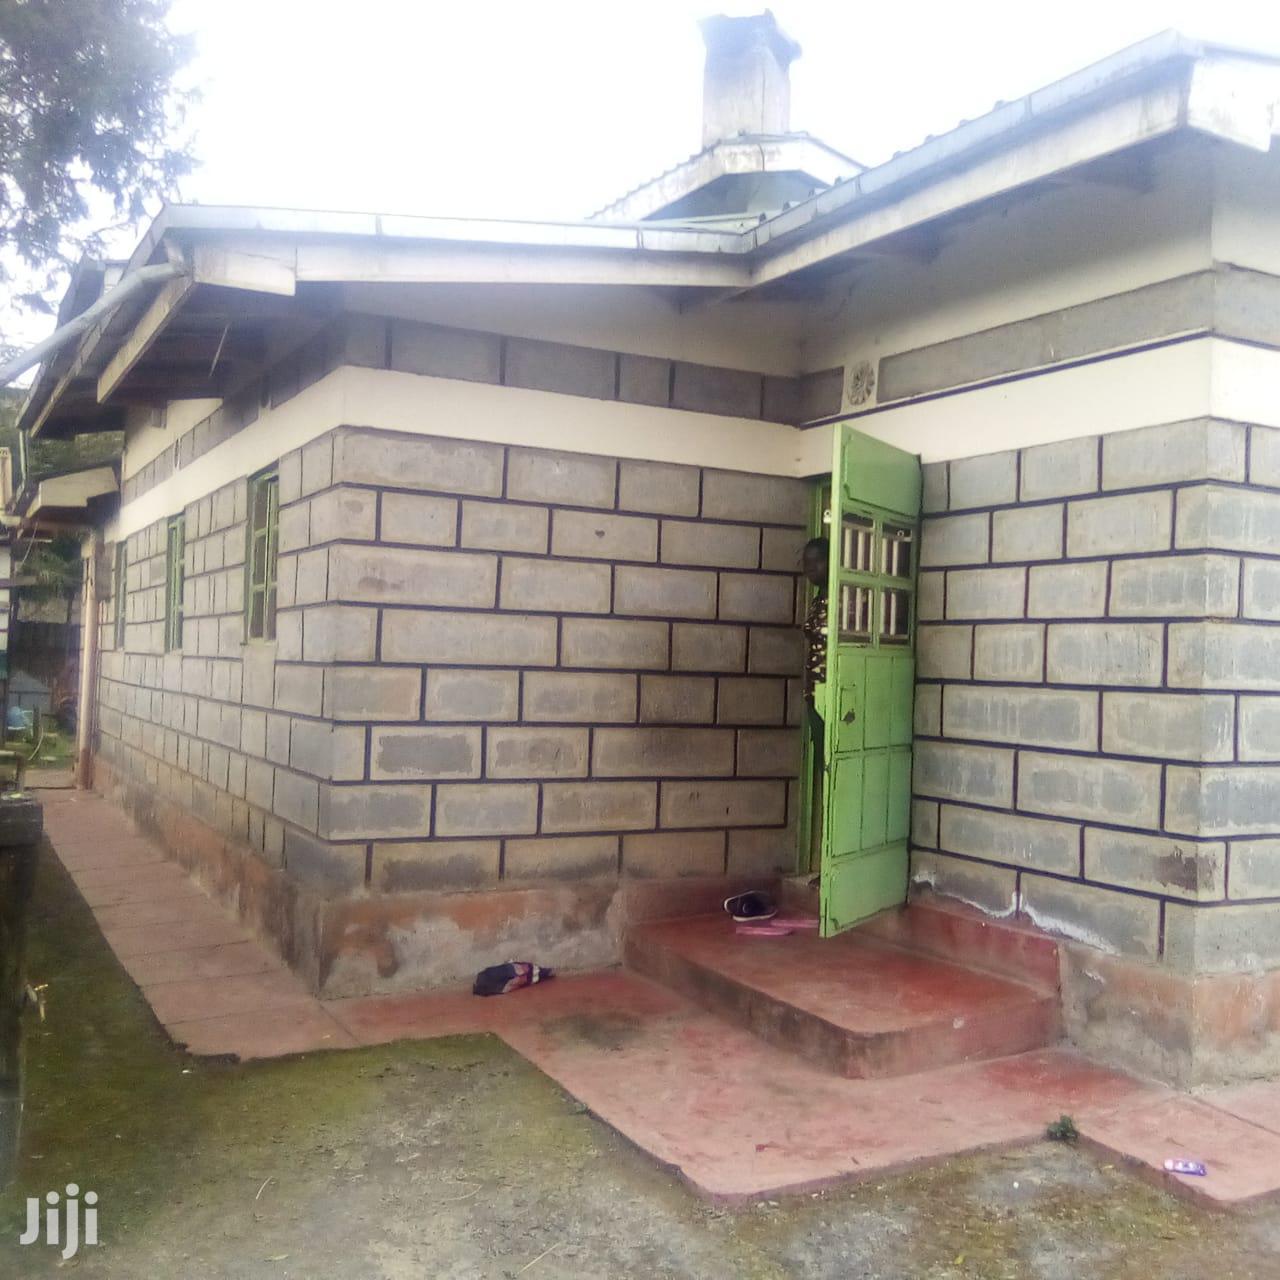 Archive: Bungalow For Sale In Njabini, Kinangop